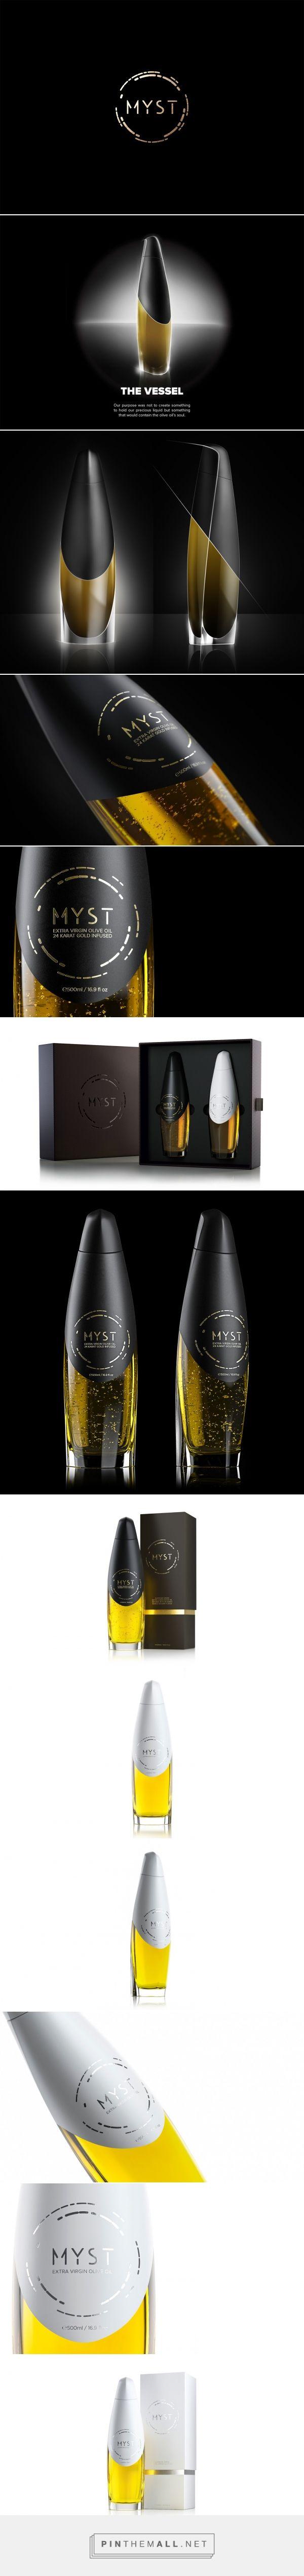 Myst - Ultra Premium OliveOil packaging design - http://www.packagingoftheworld.com/2016/07/myst-ultra-premium-olive-oil.html